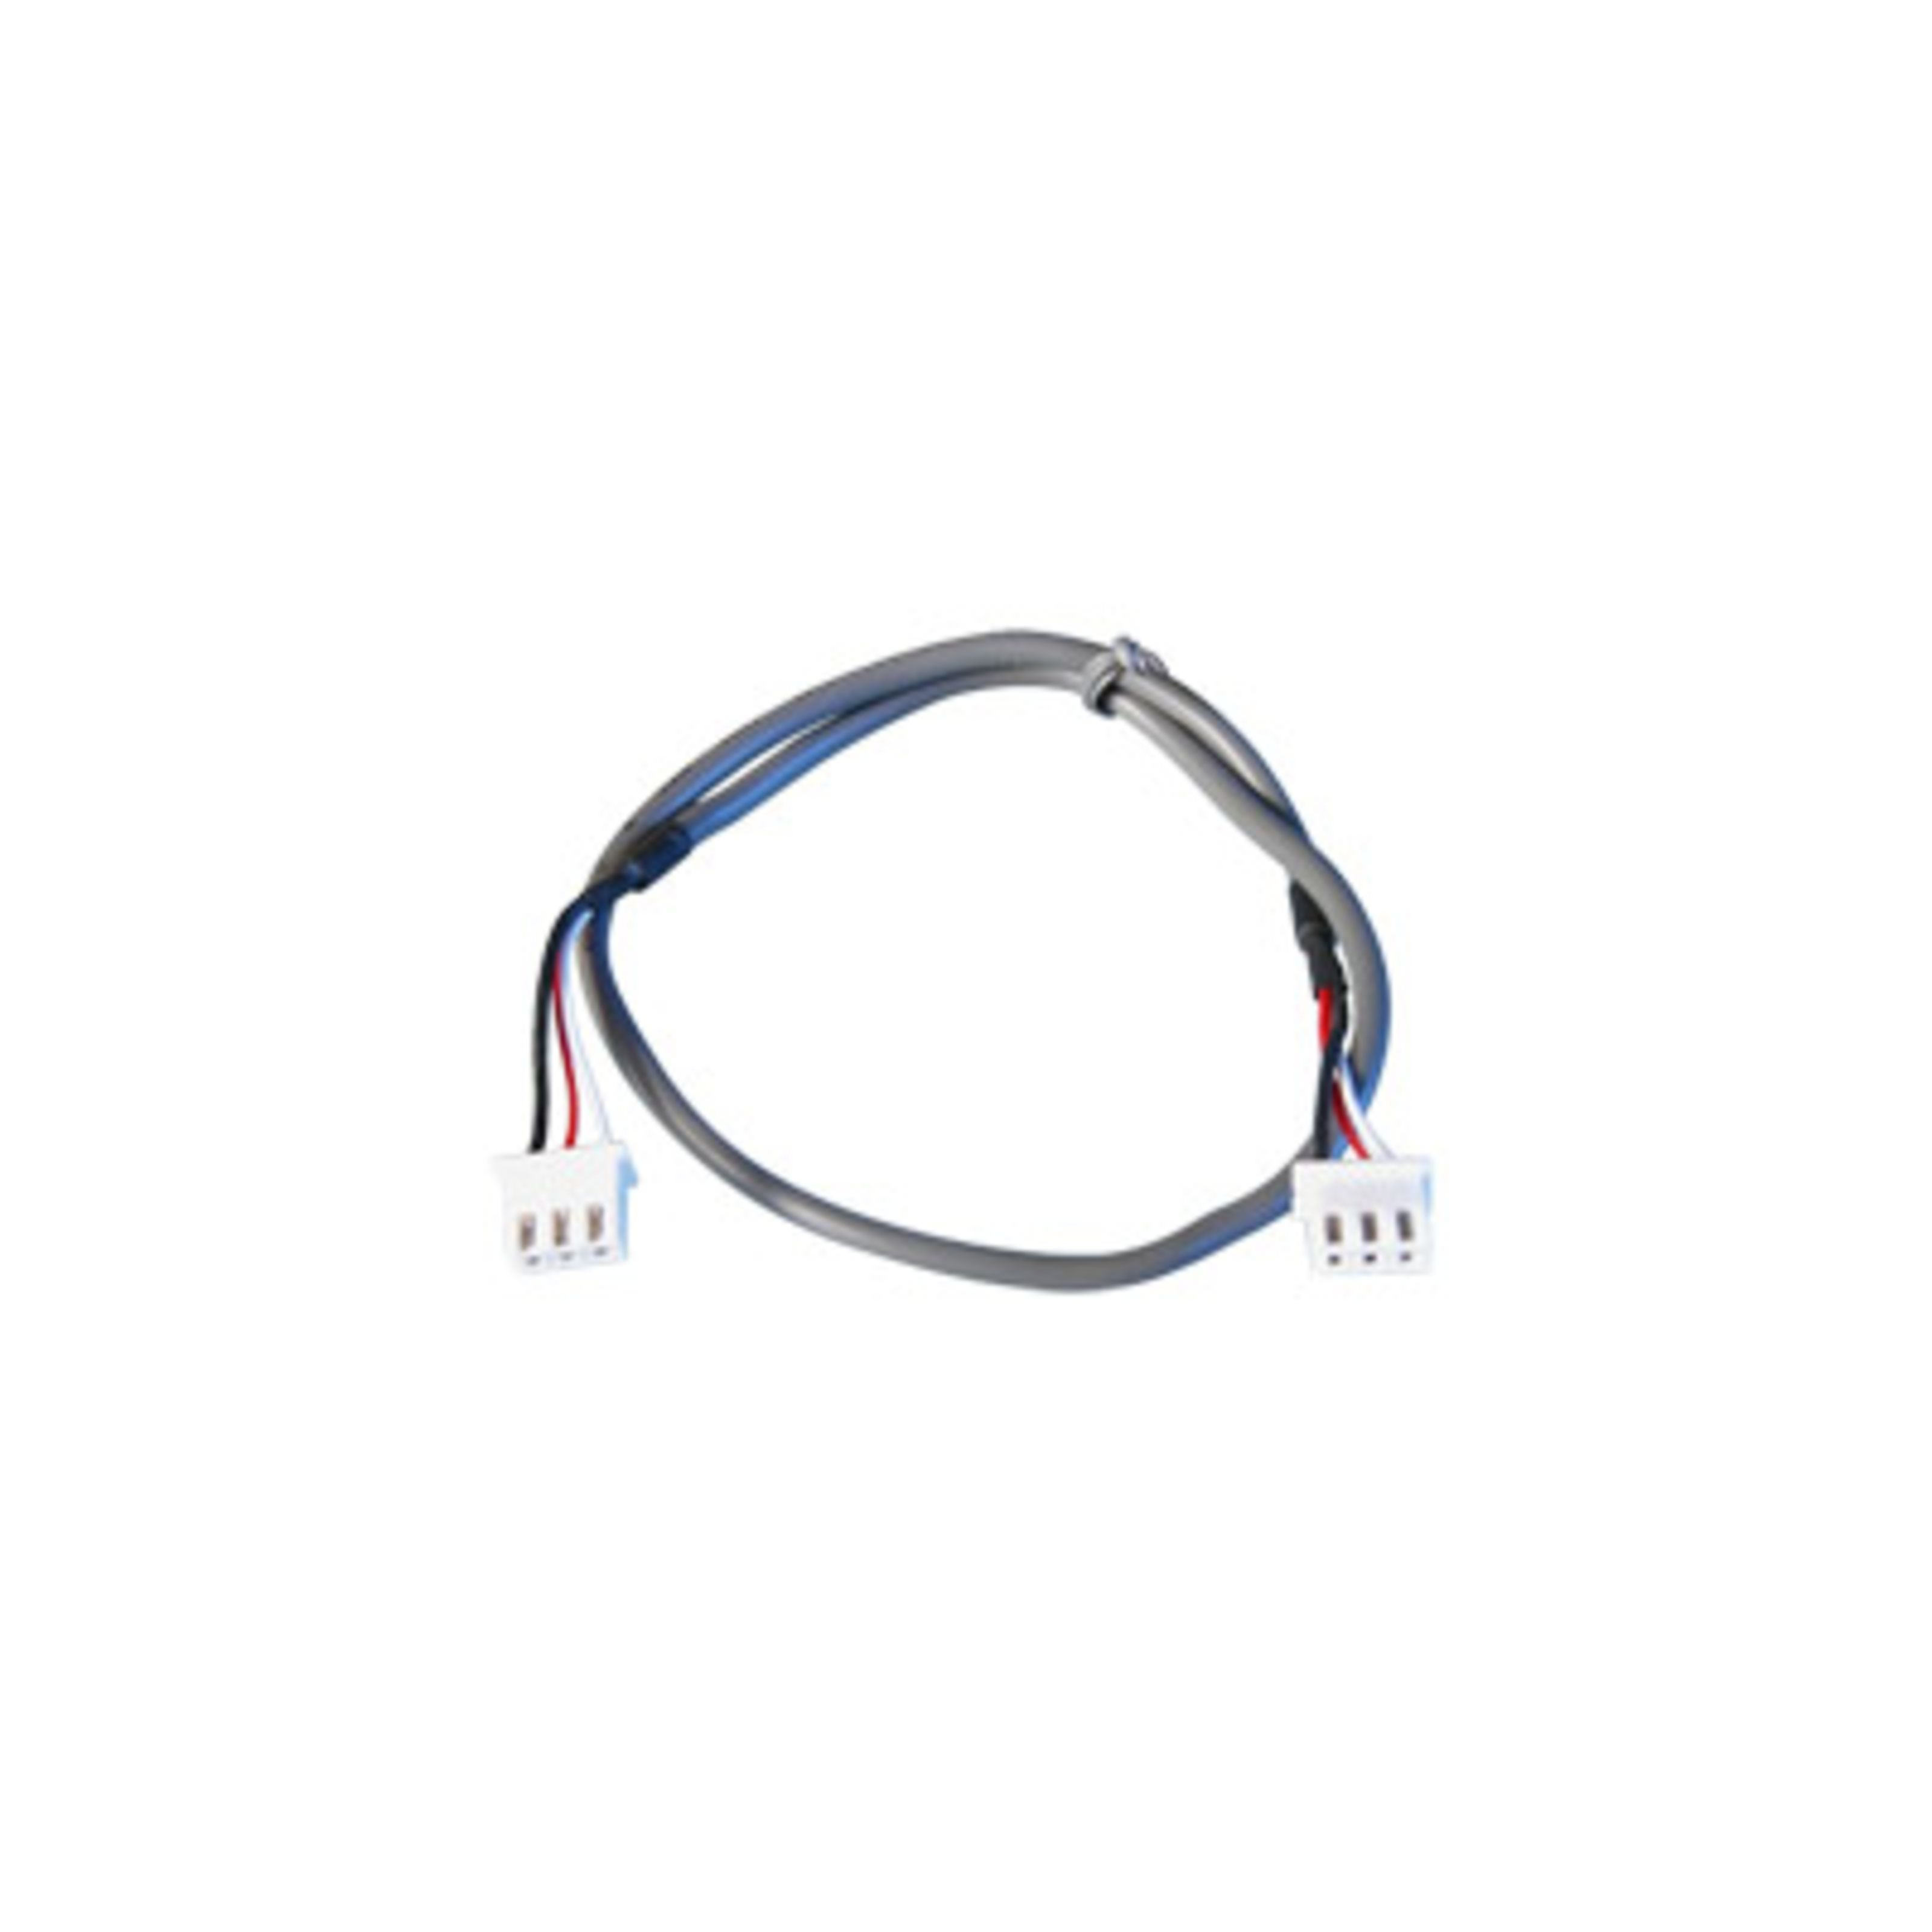 RME - Wordclock-Kabel intern, 3polig 1000063